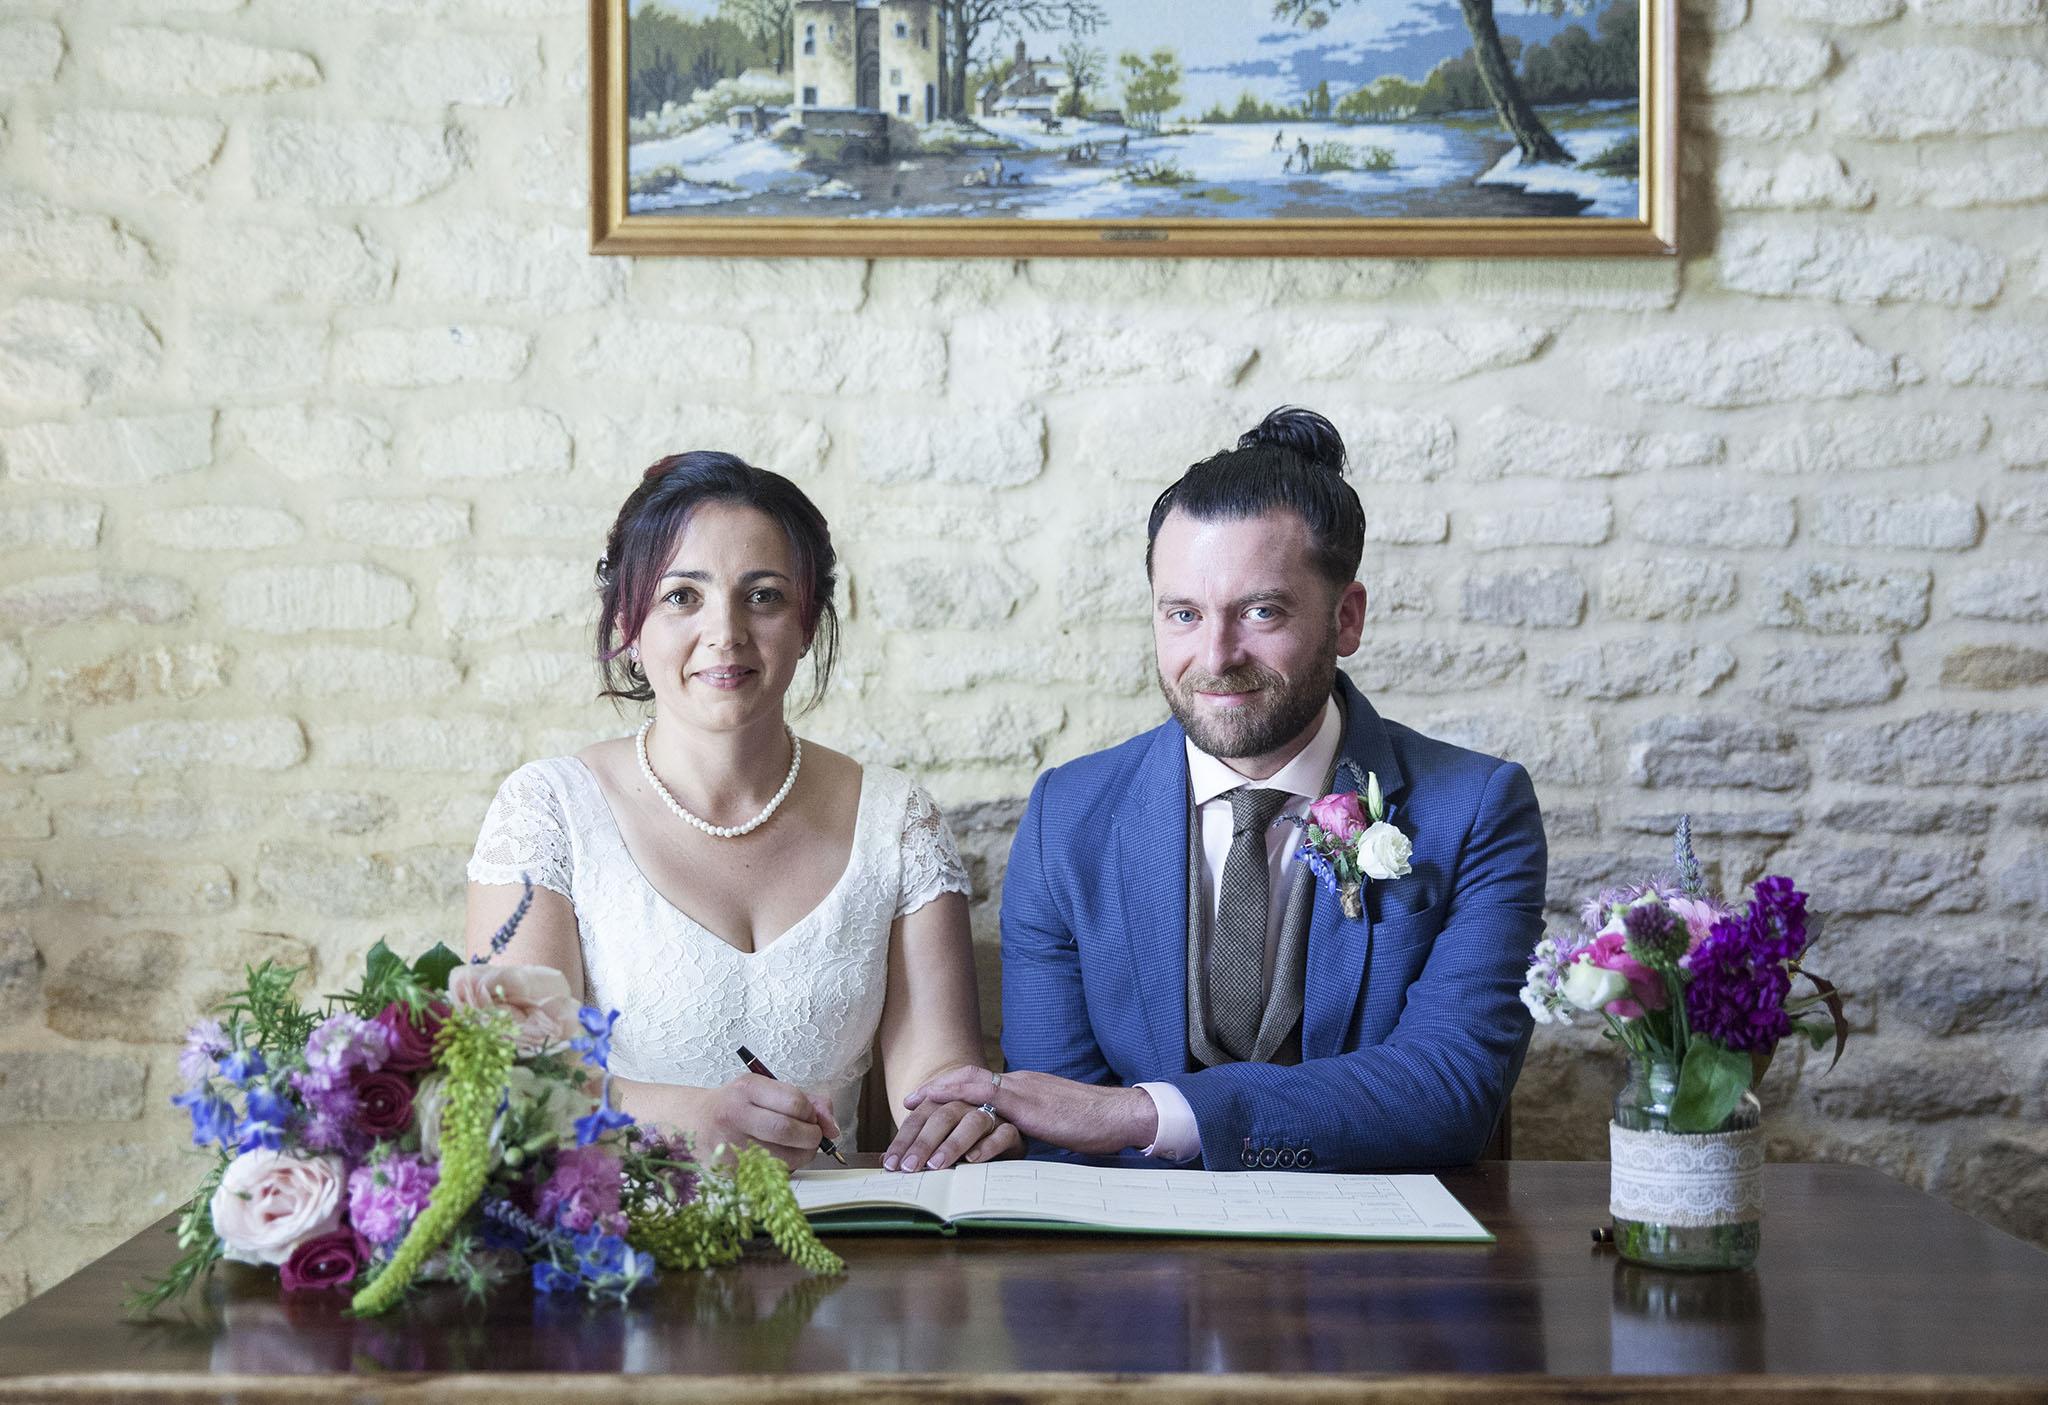 elizabethgphotography_kingslangley_hertfordshire_fineart_wedding_photography_lincolnshire_anna_simon_21.jpg